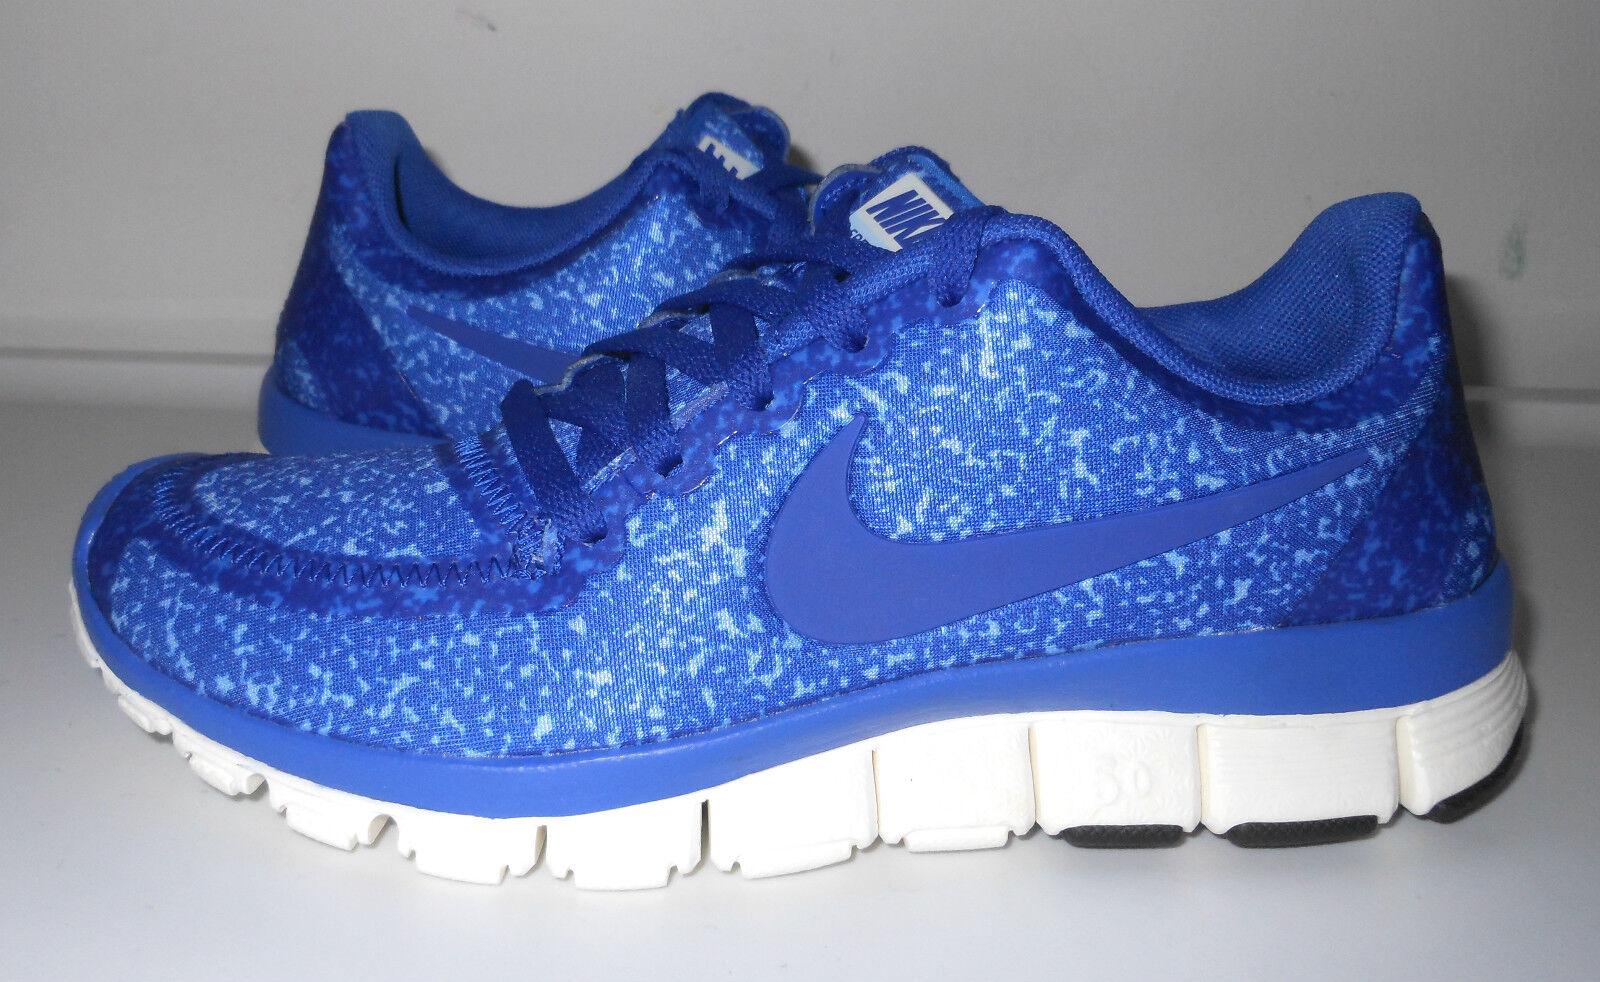 Nike sz 5 donne - sz gioventù libera v4 scarpe nuove 511281 403 blu